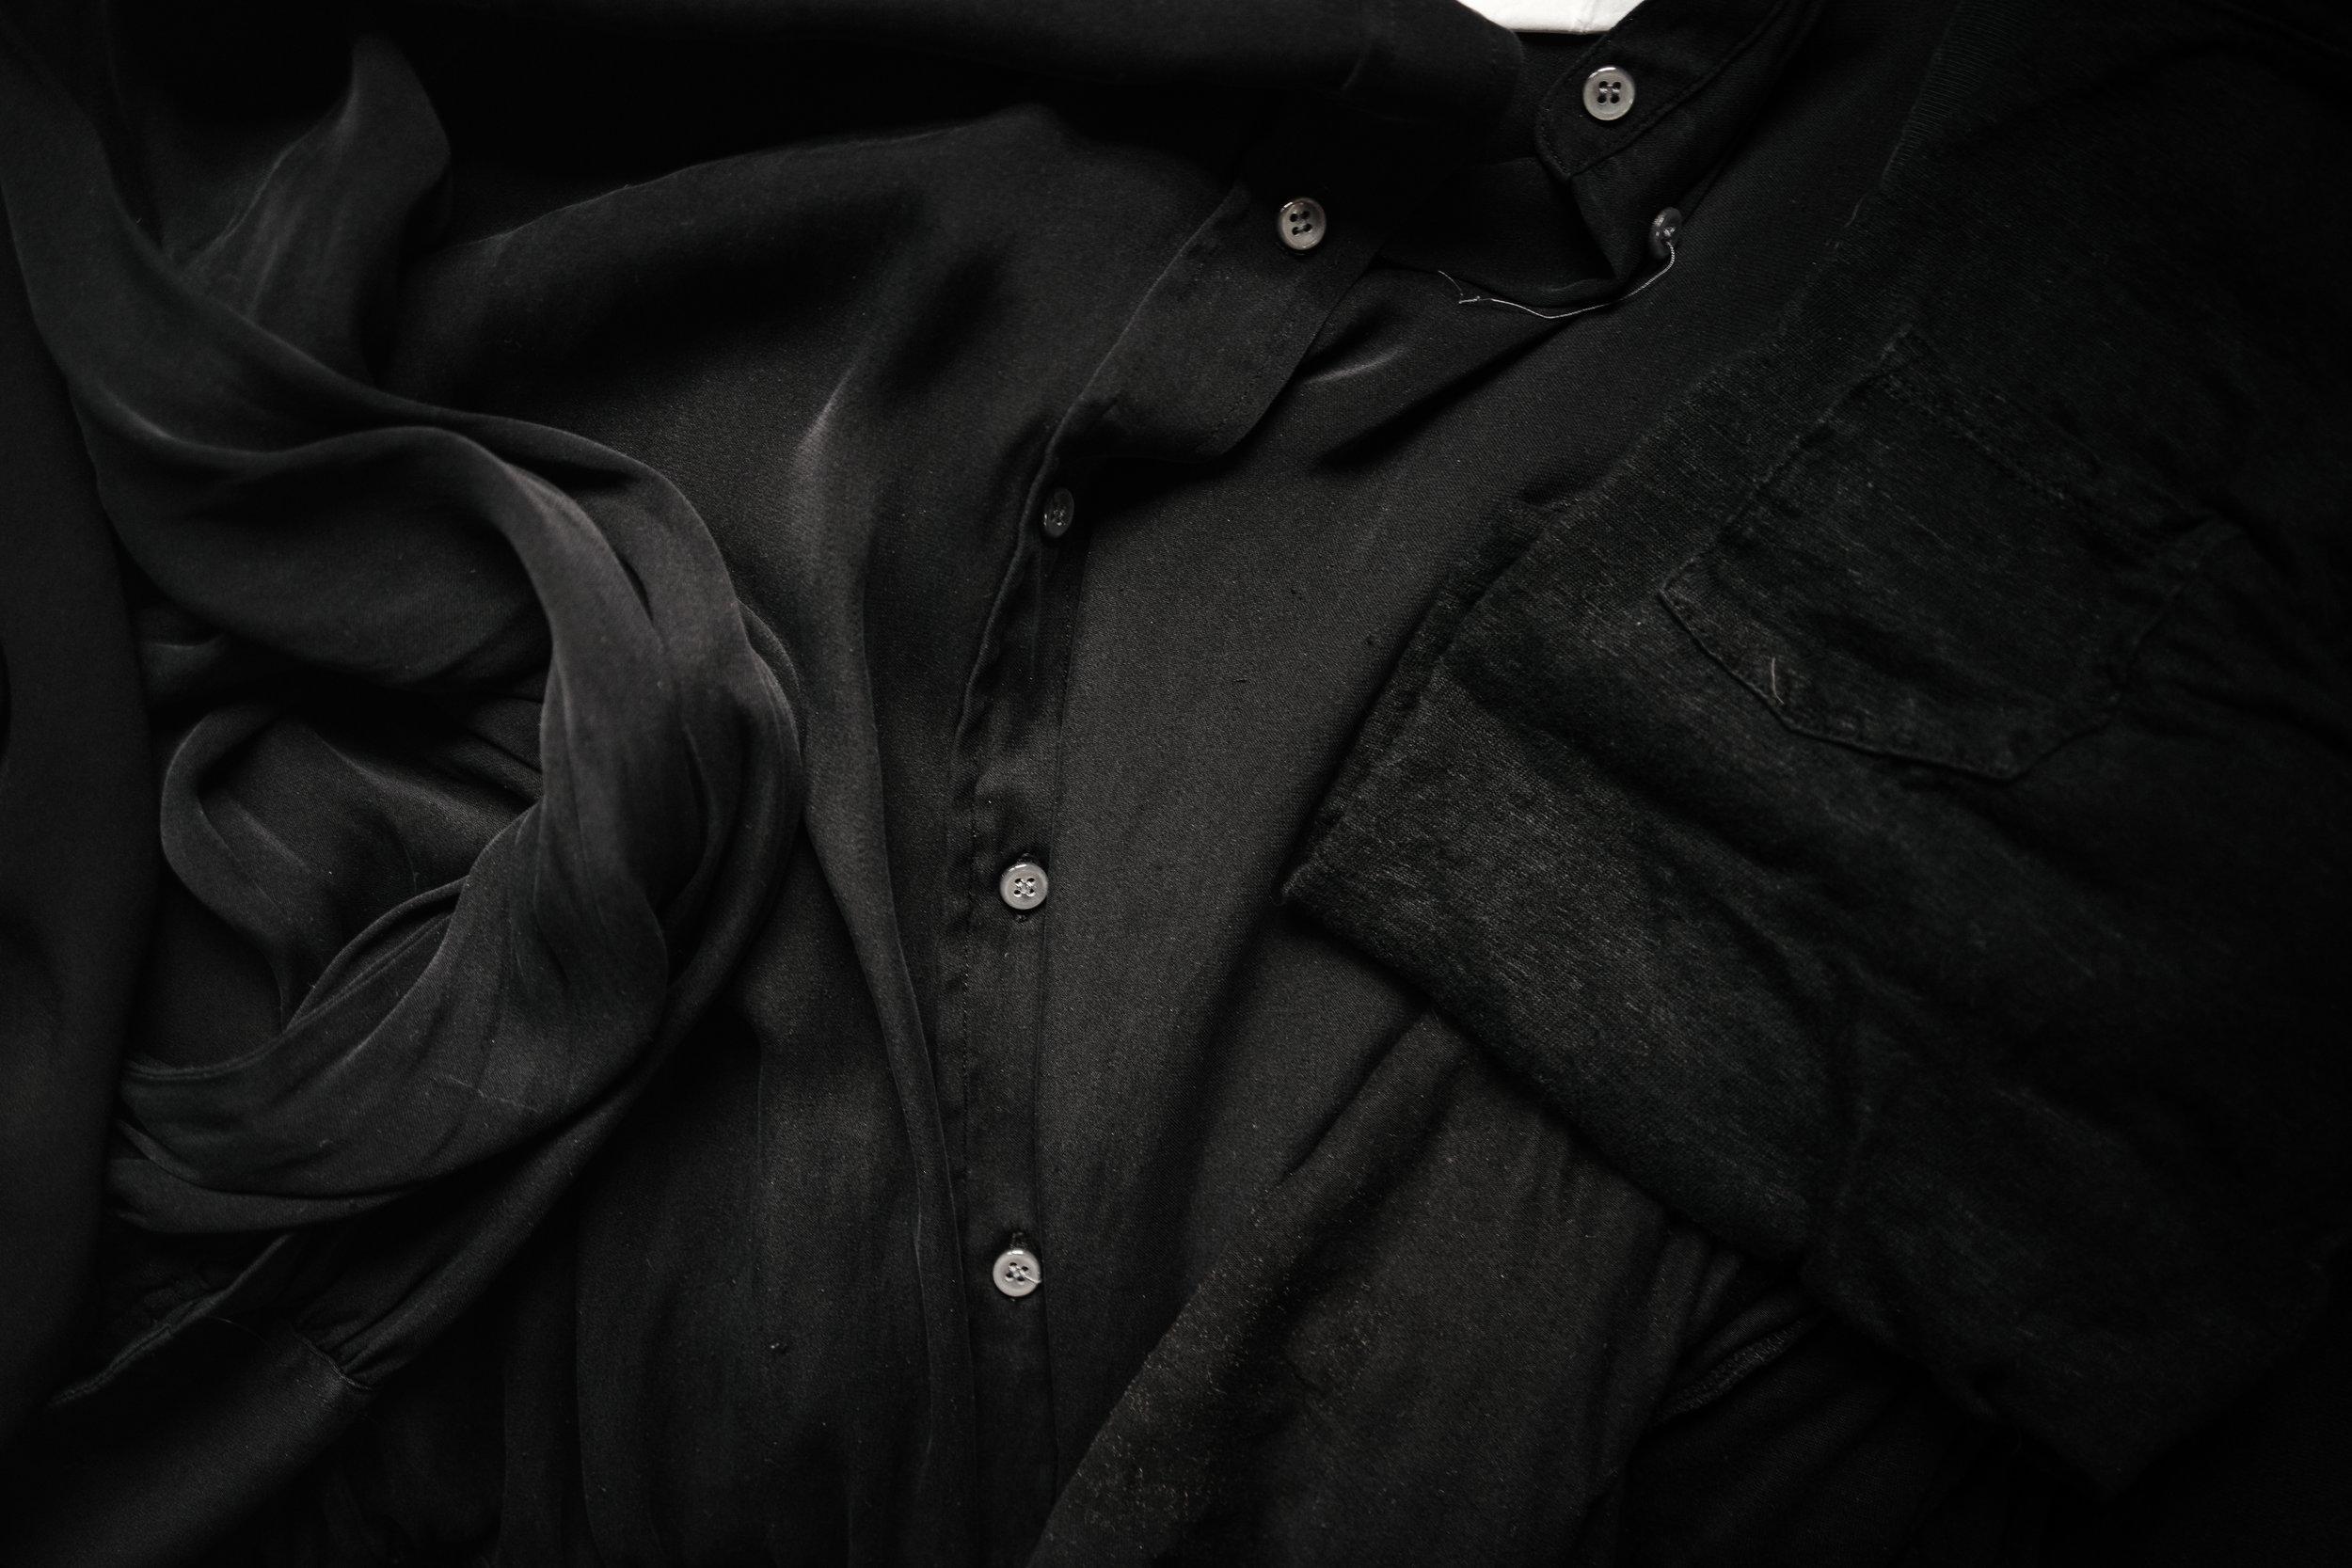 cunningham-clothing-forreed-2.jpg